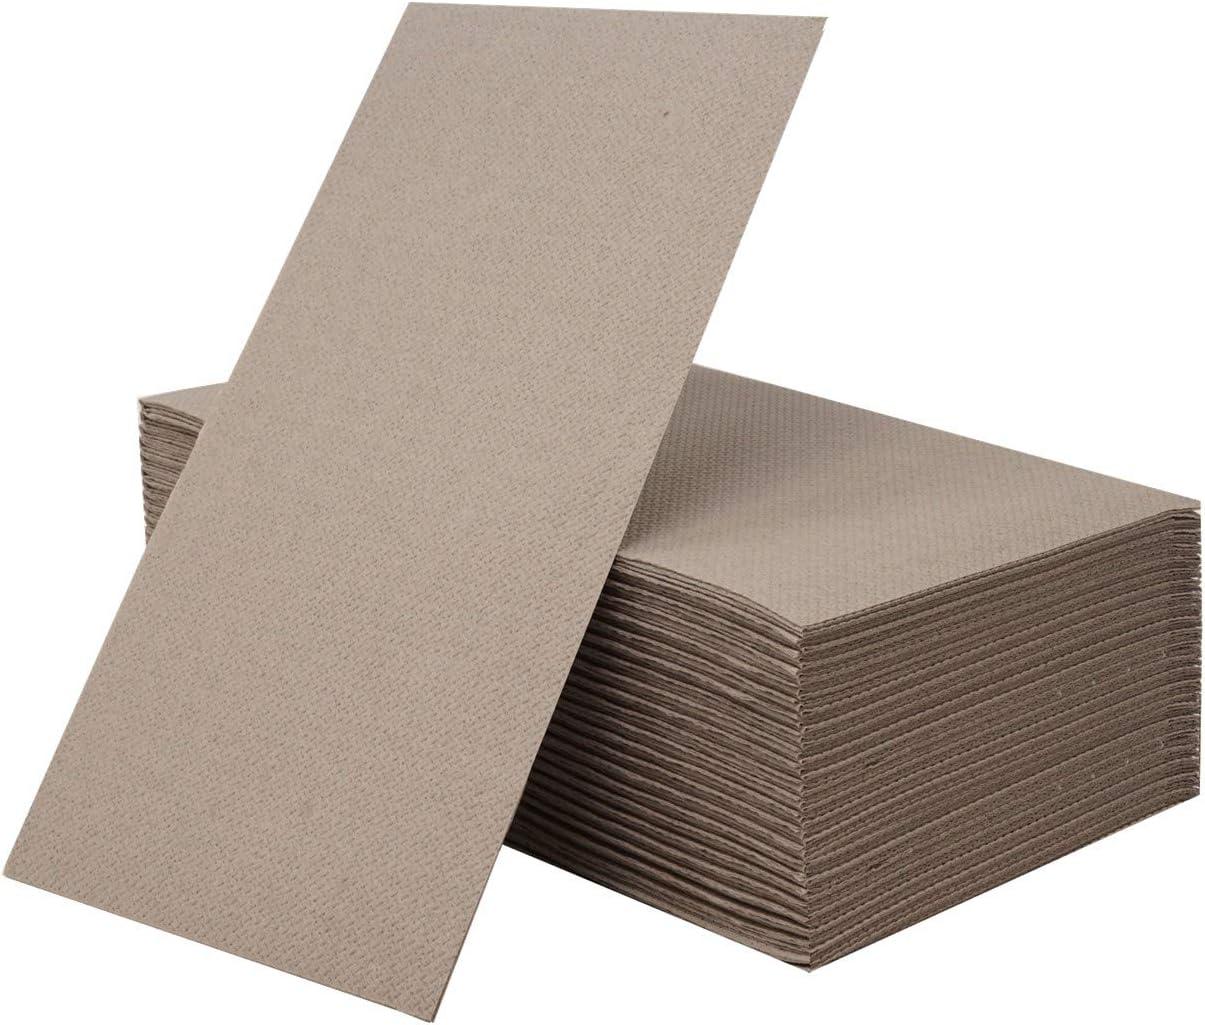 Linen Feel Guest Hand Towels - Napki Like Cloth Disposable Paper Bargain Regular dealer sale